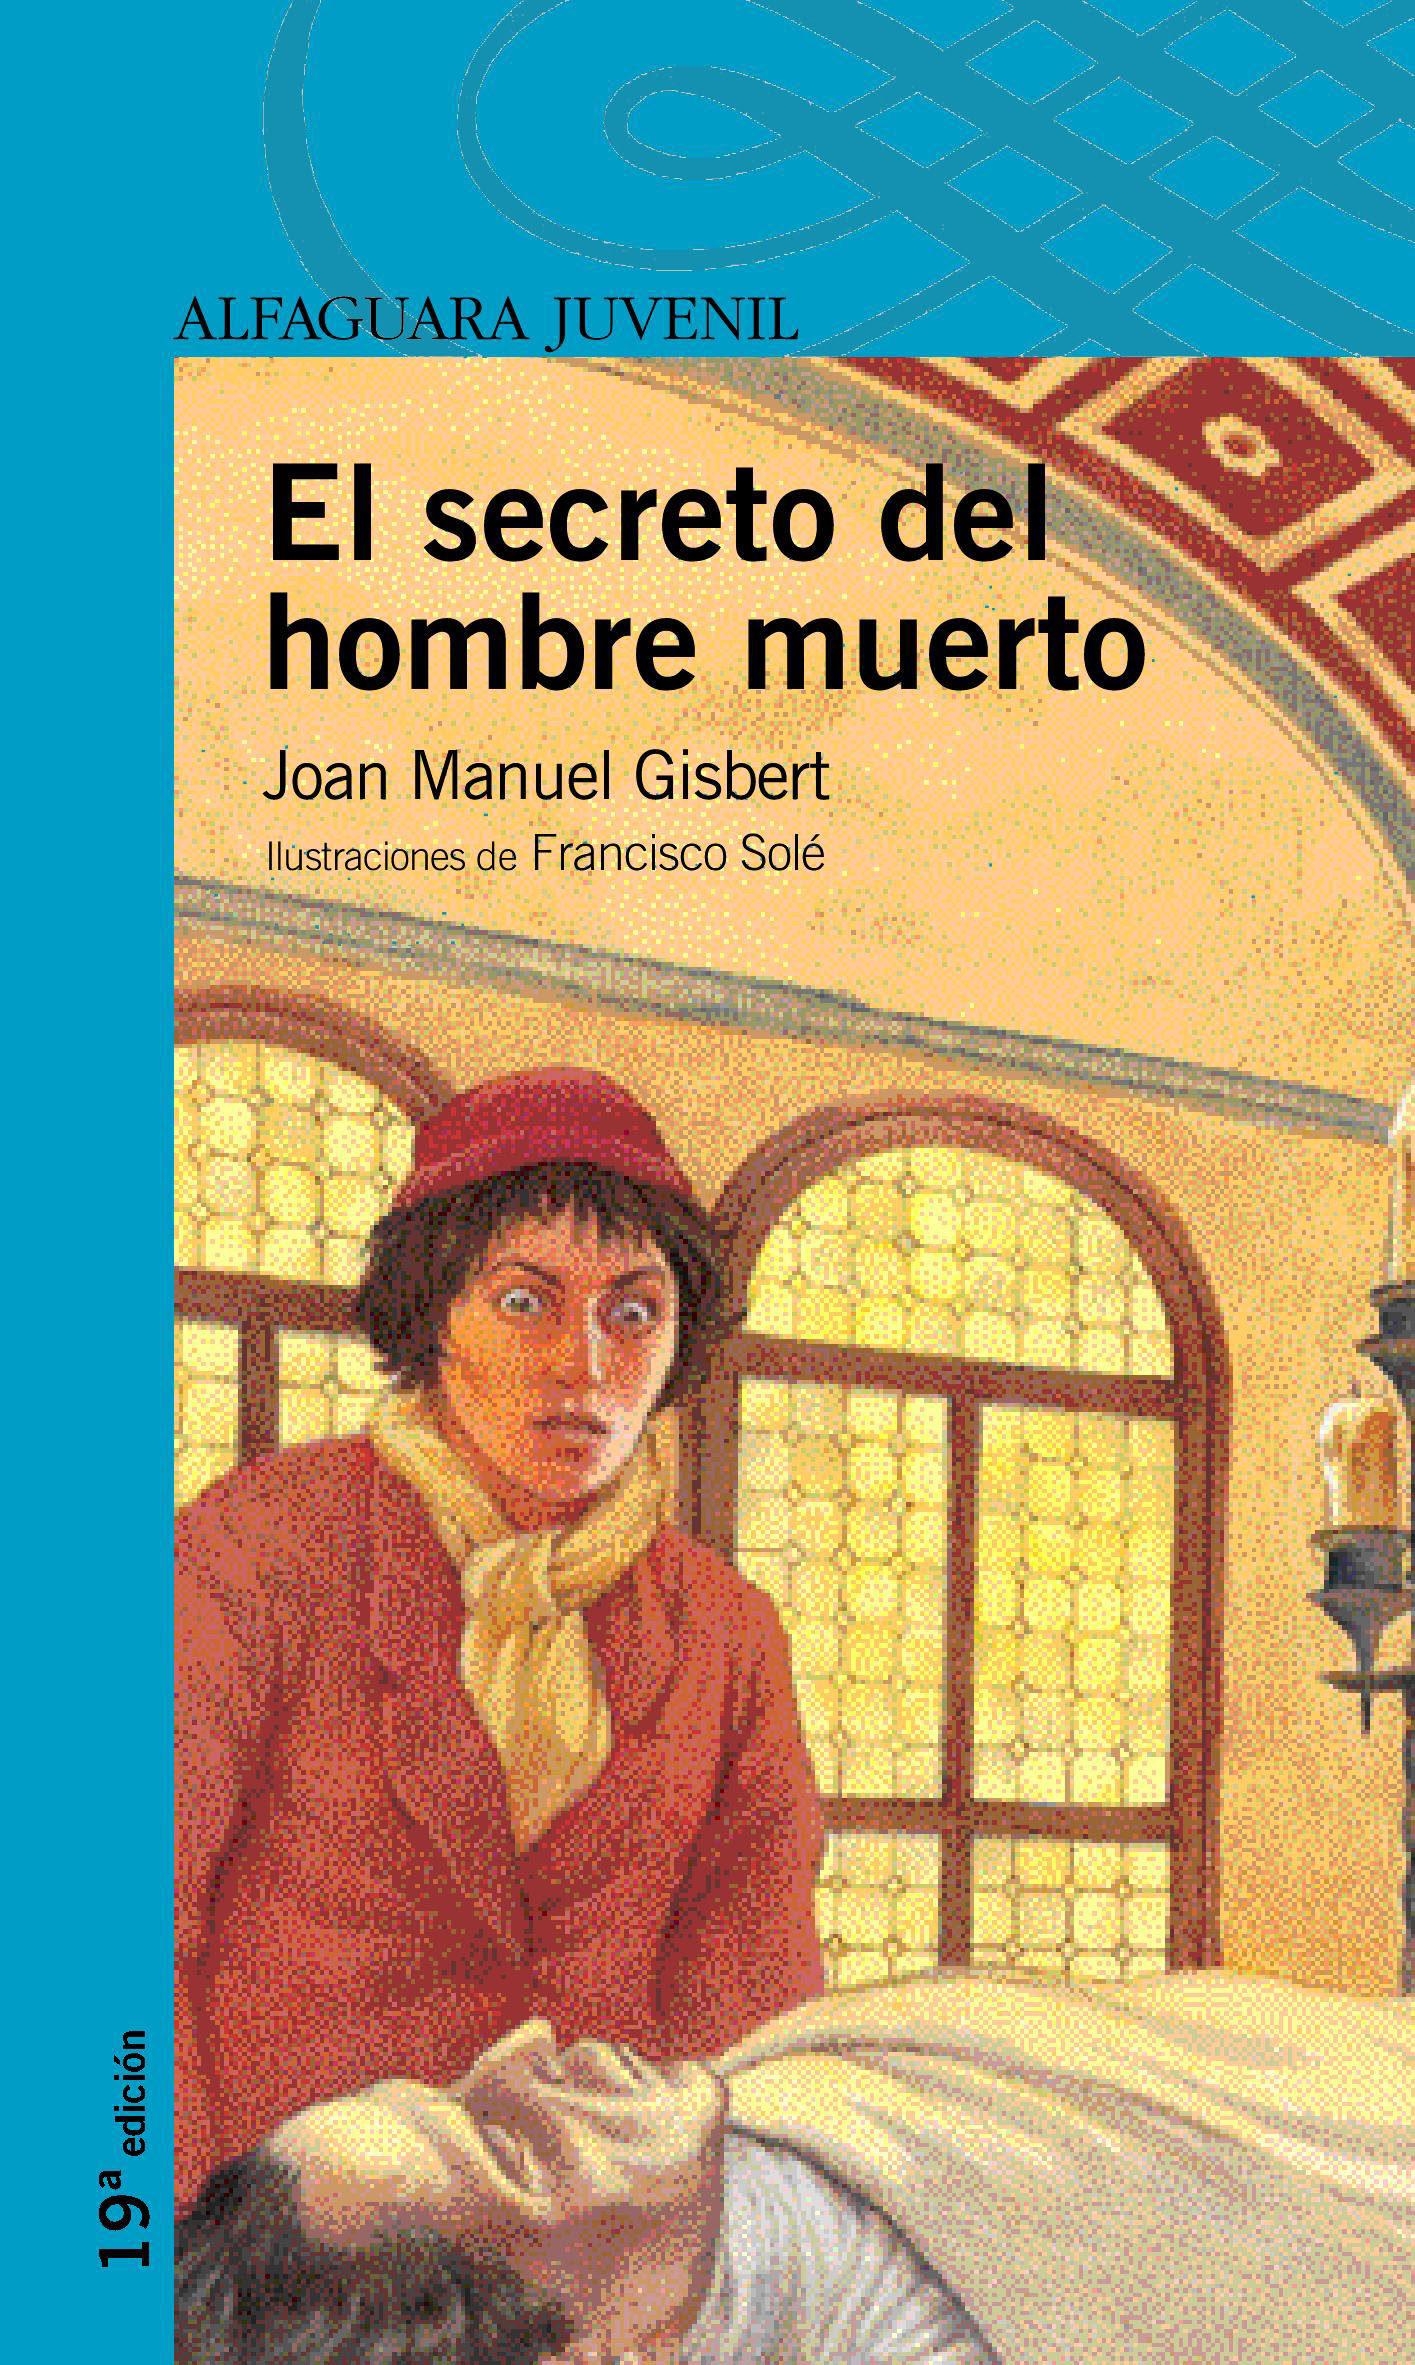 El secreto del hombre muerto 9788420464923